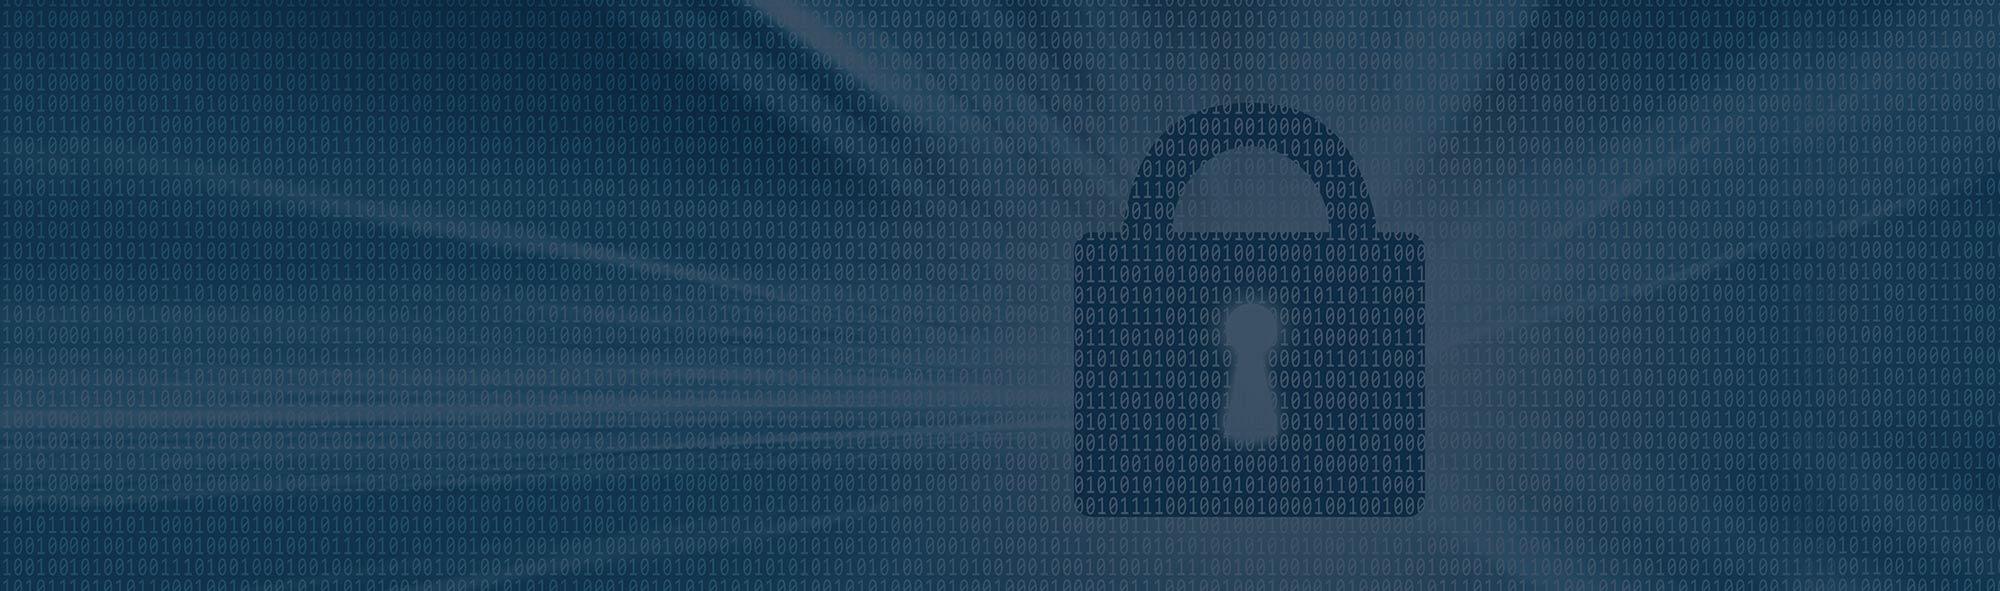 Securing ServiceNow data webinar